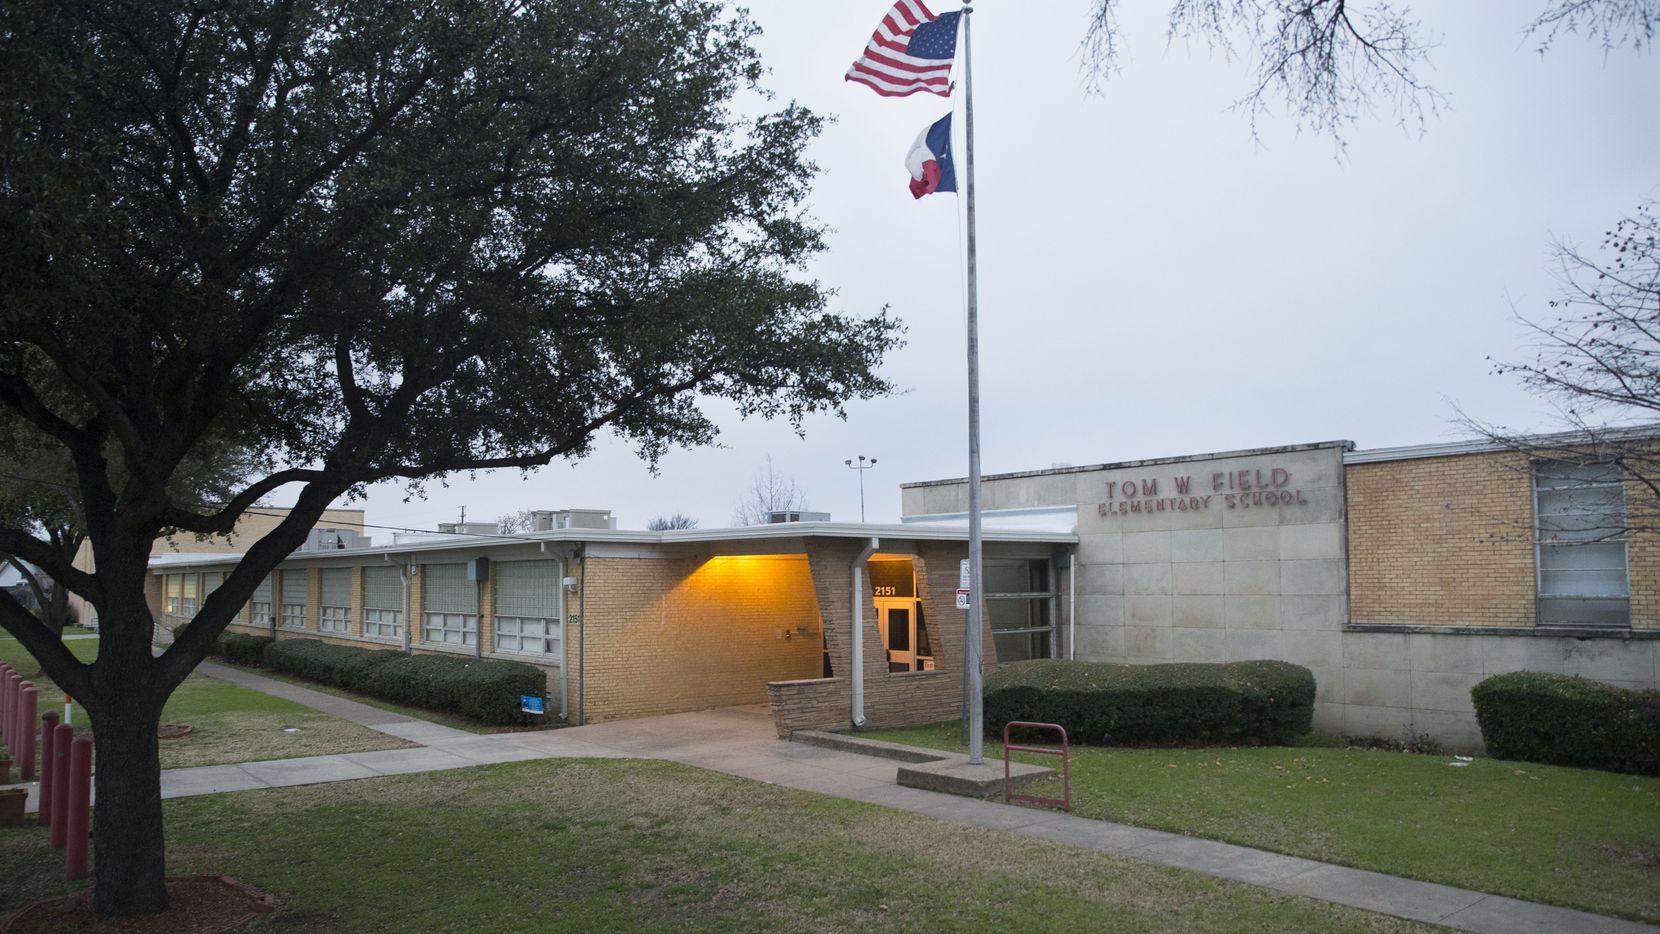 Tom Field Elementary School in Dallas on Sunday, January 13, 2019.